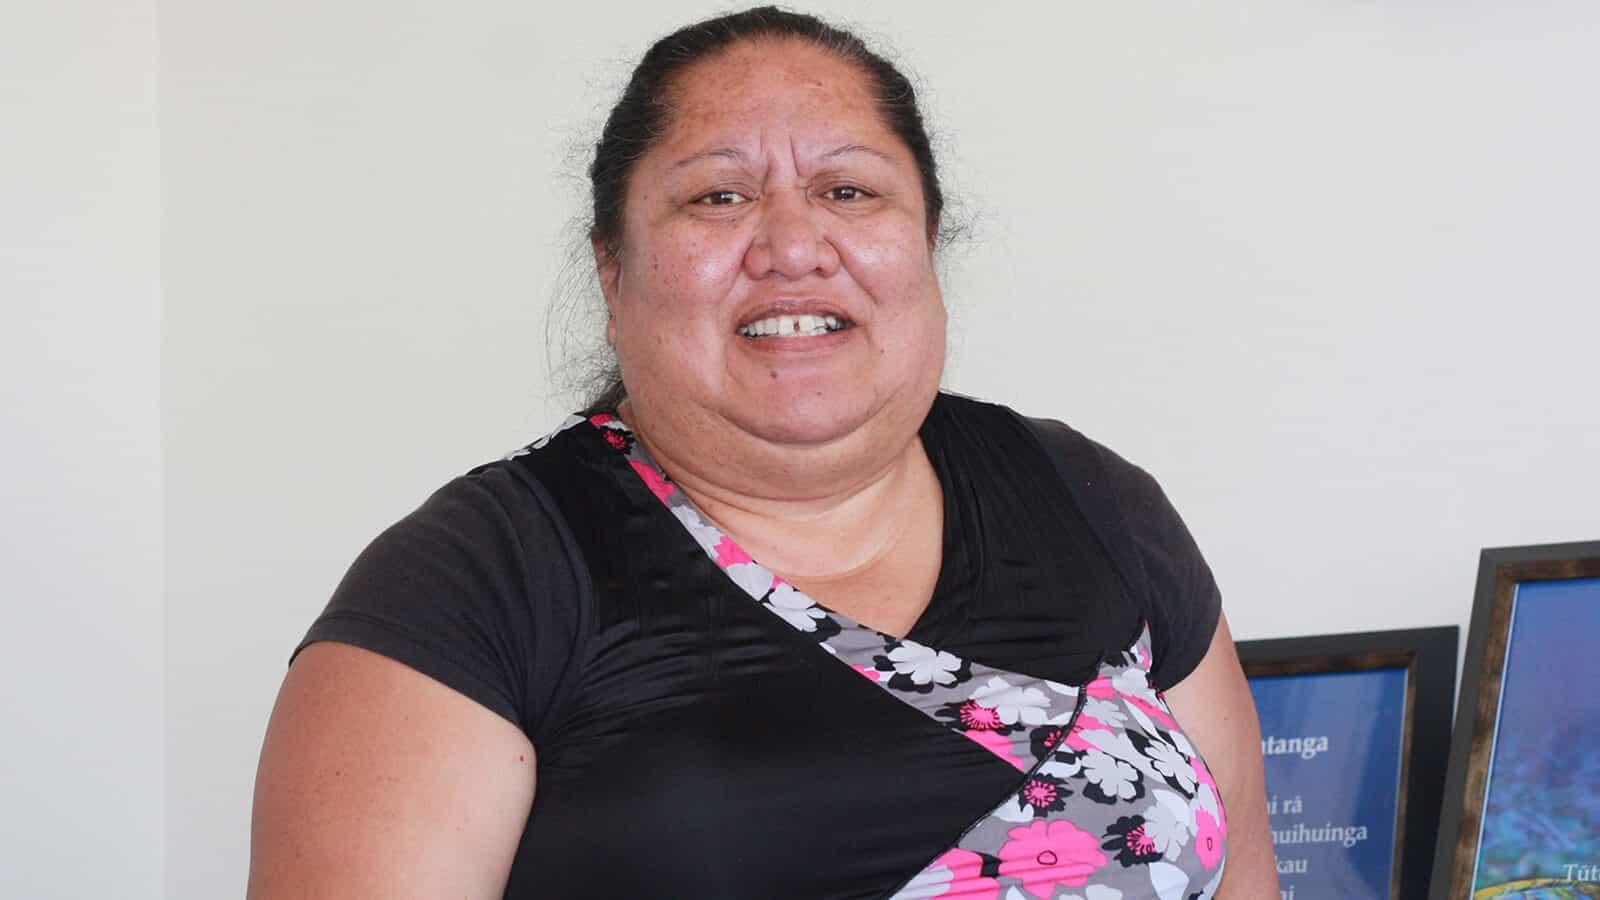 Maureen Mua champions the Maraenui Suburban Revitilisation Project